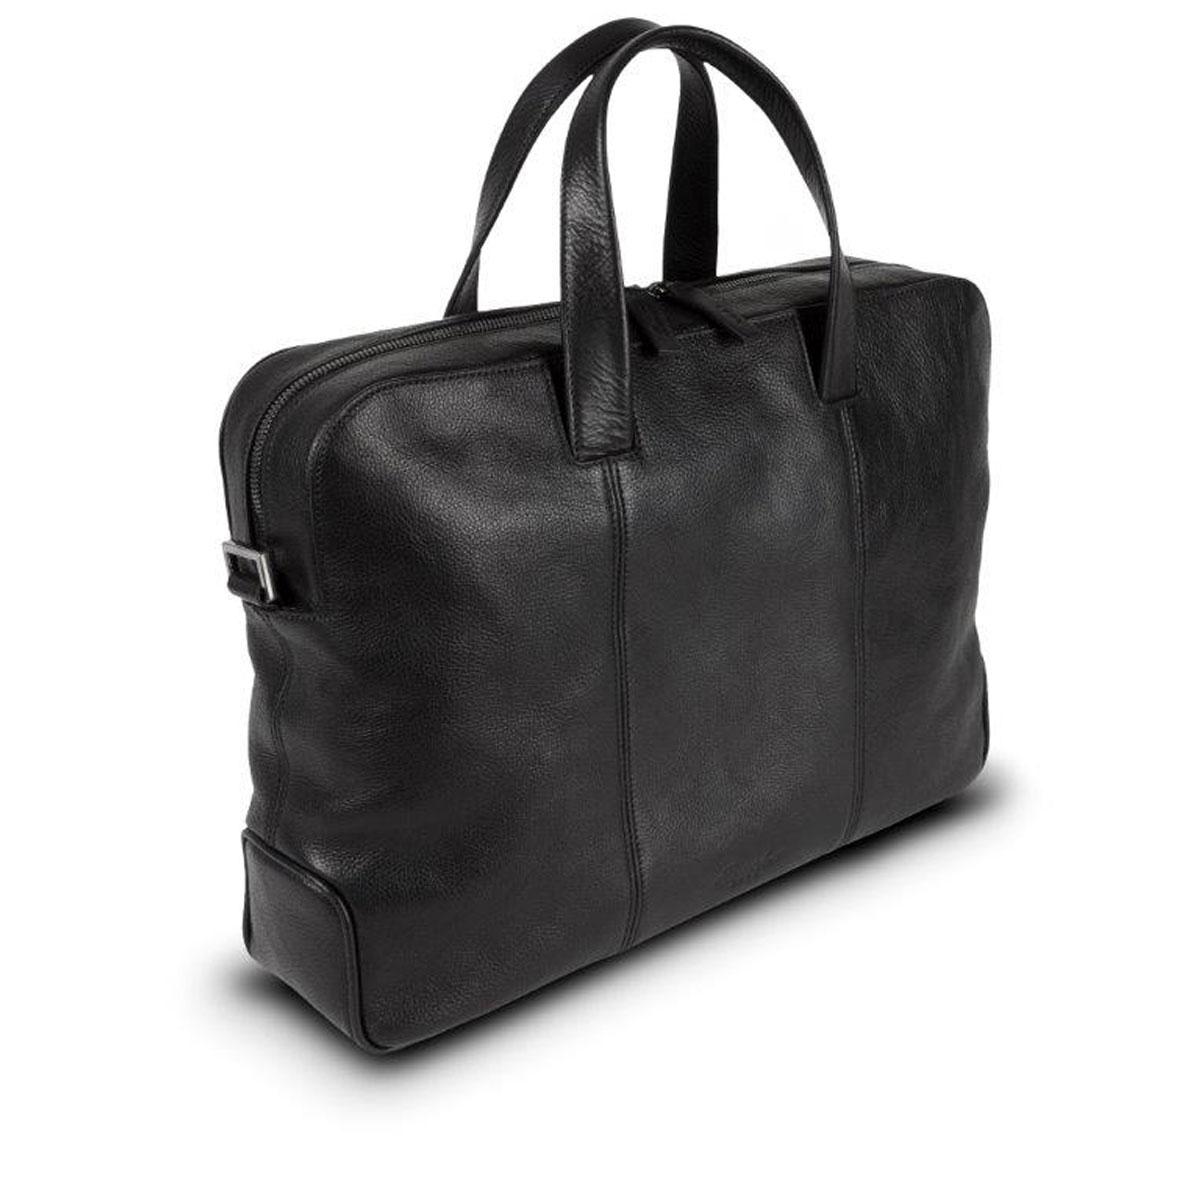 5d1f2f141576 Pineider Country Black Leather 2-Handle Document & Laptop Bag   Shoulder  Strap